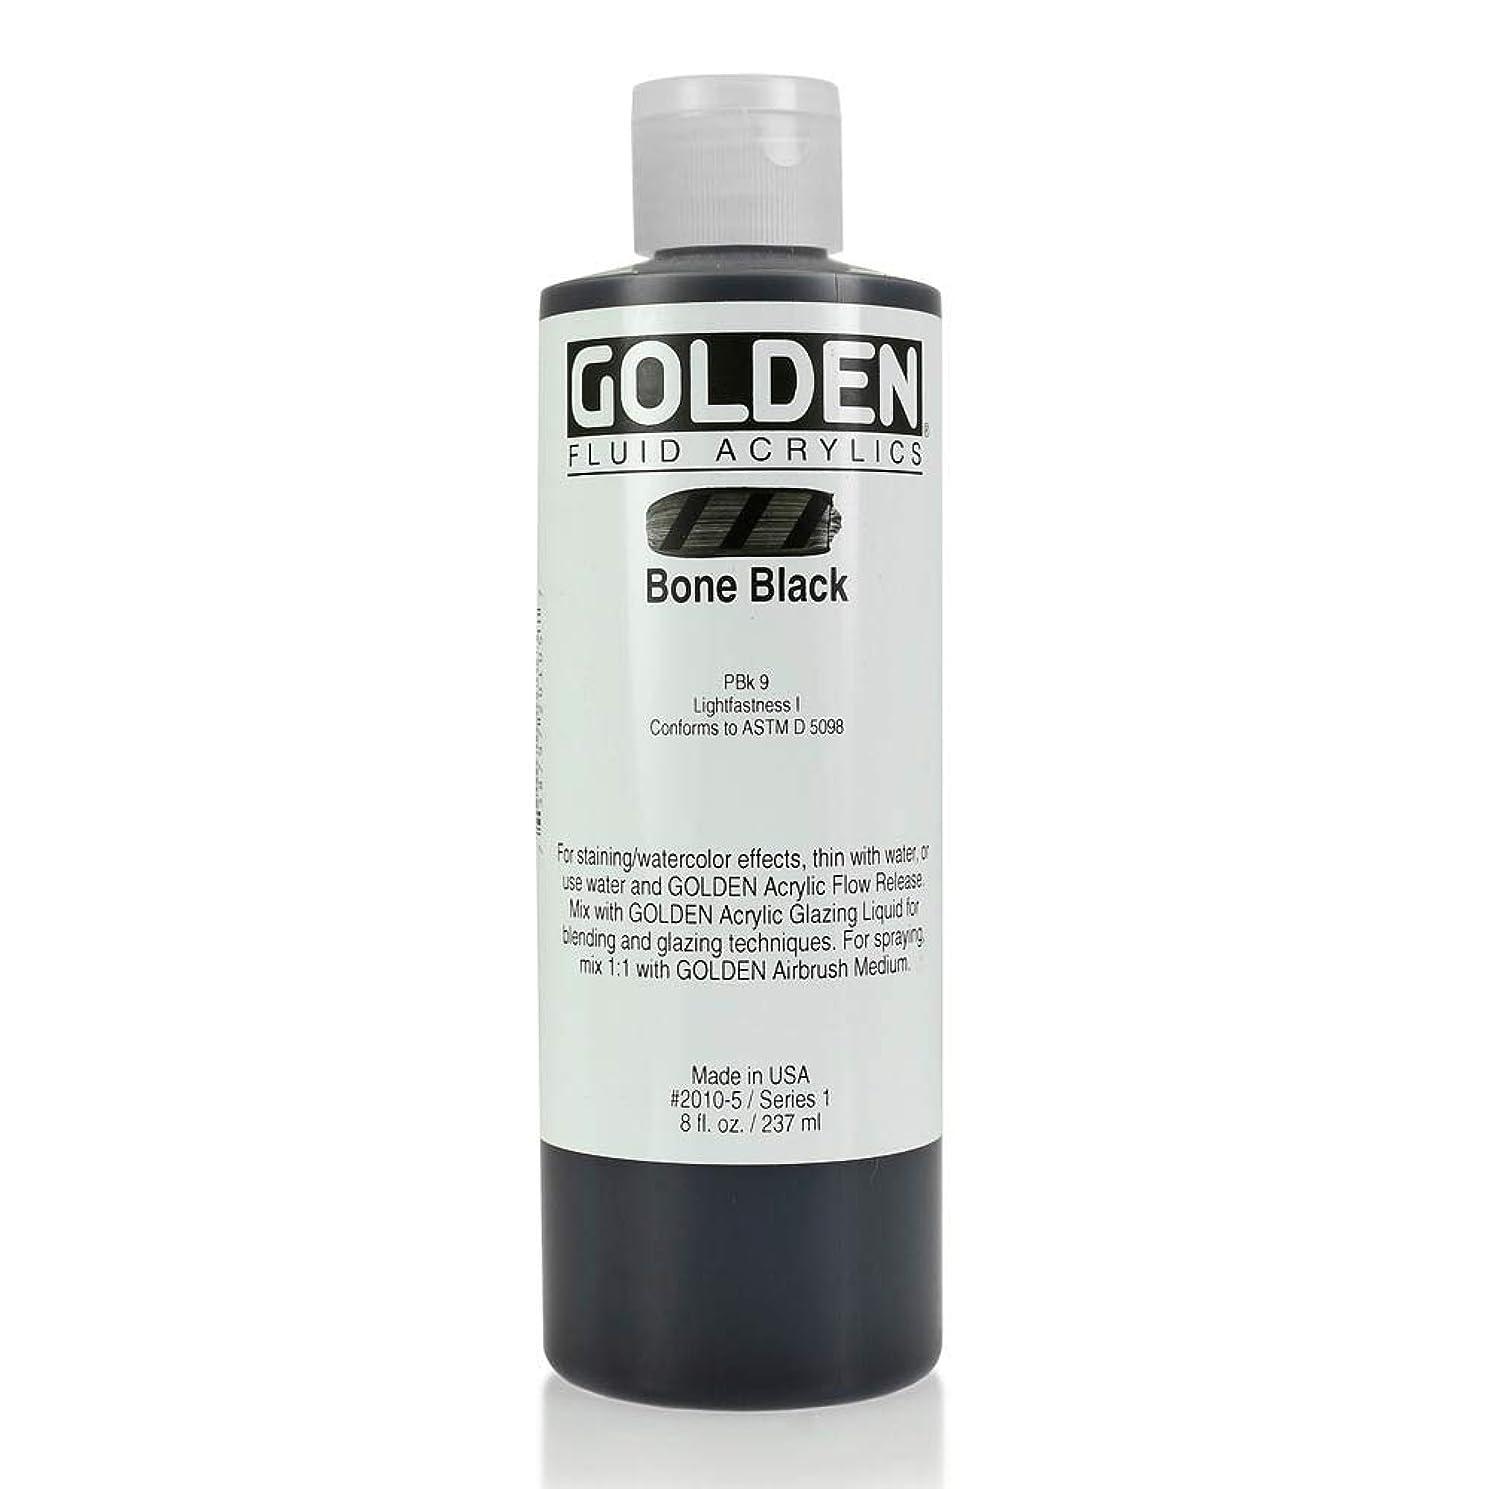 Golden Fluid Acrylics - Bone Black 8 oz bottle